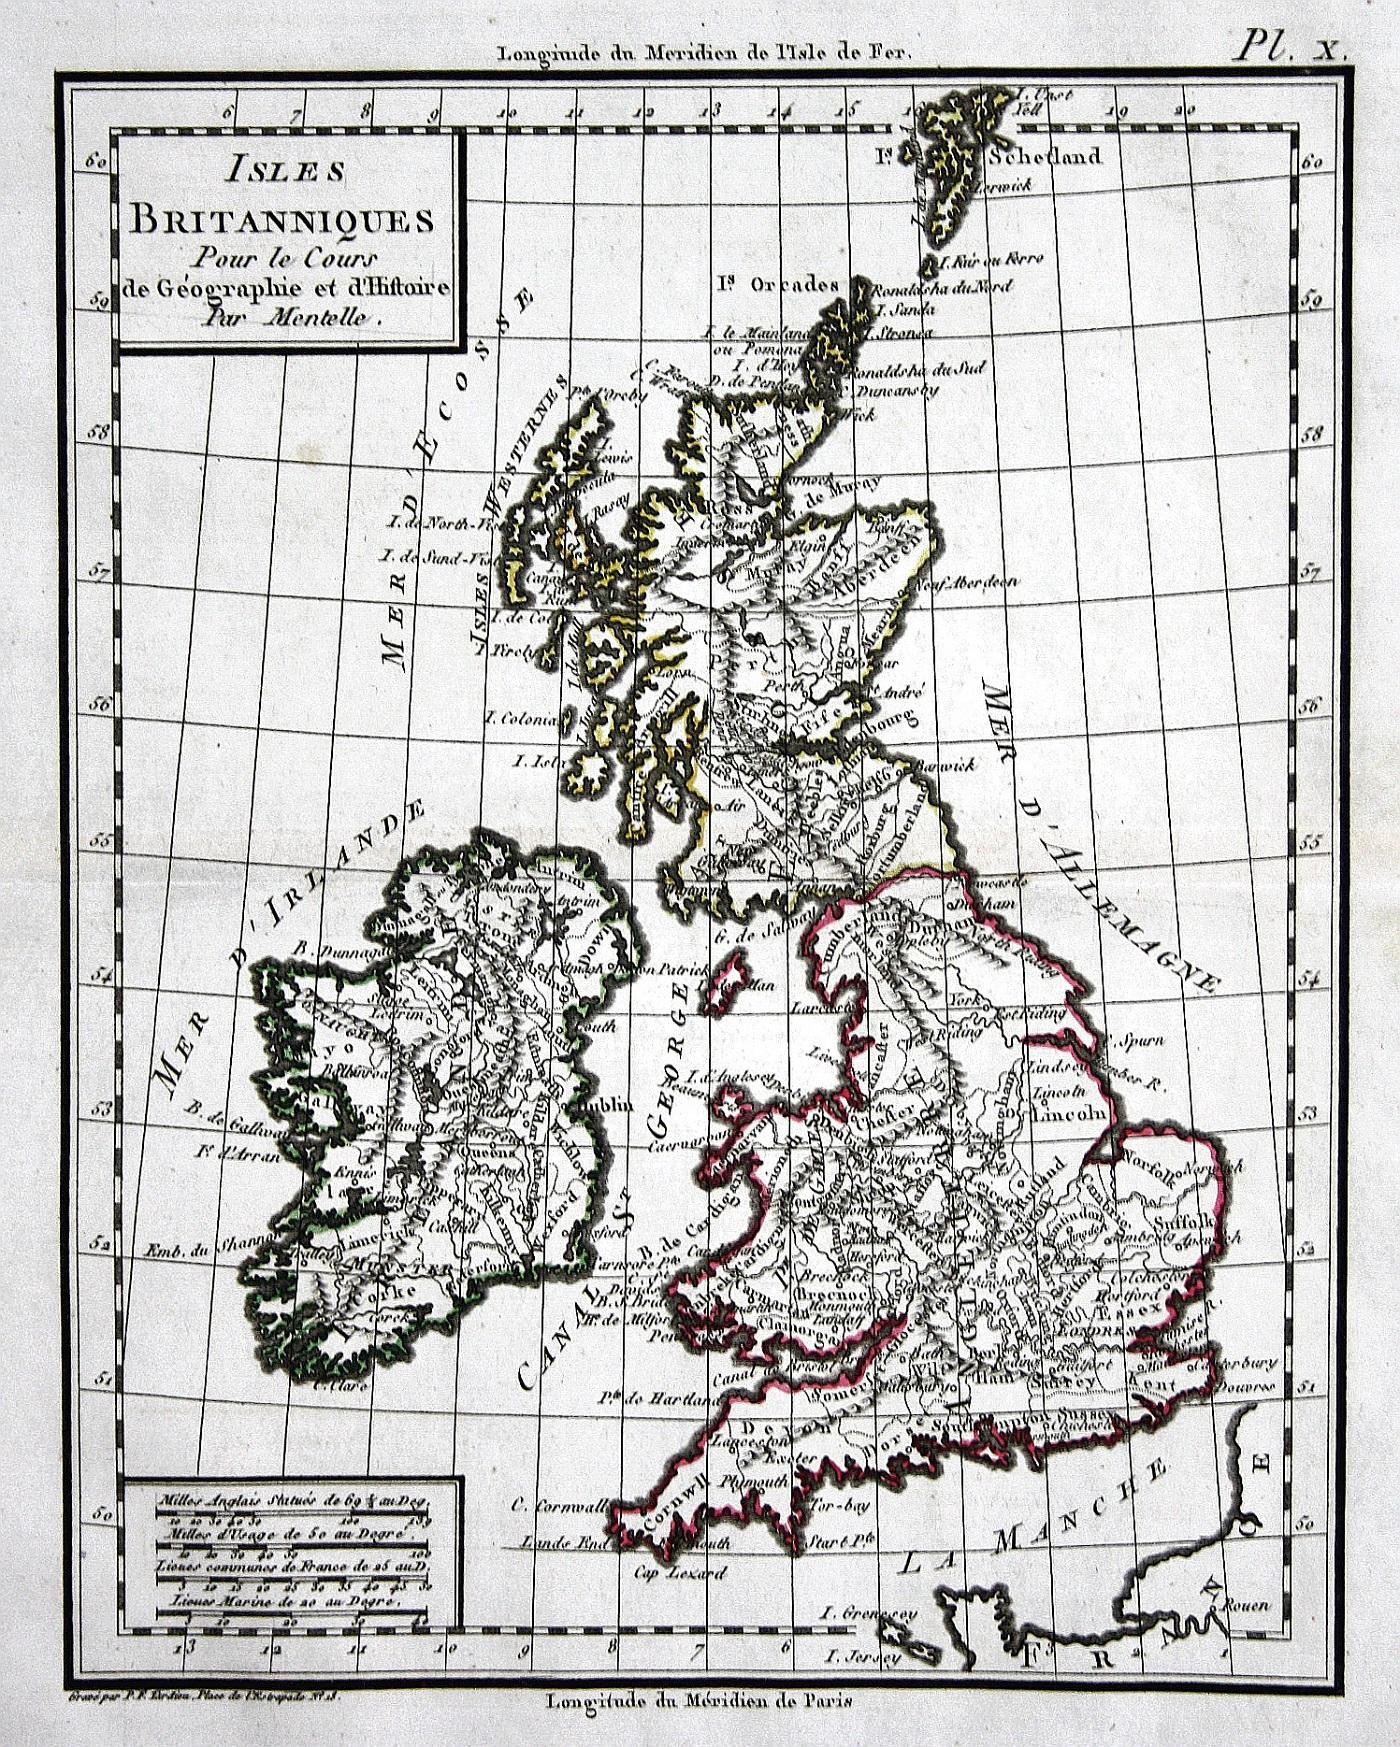 Karte London.Isles Britanniques